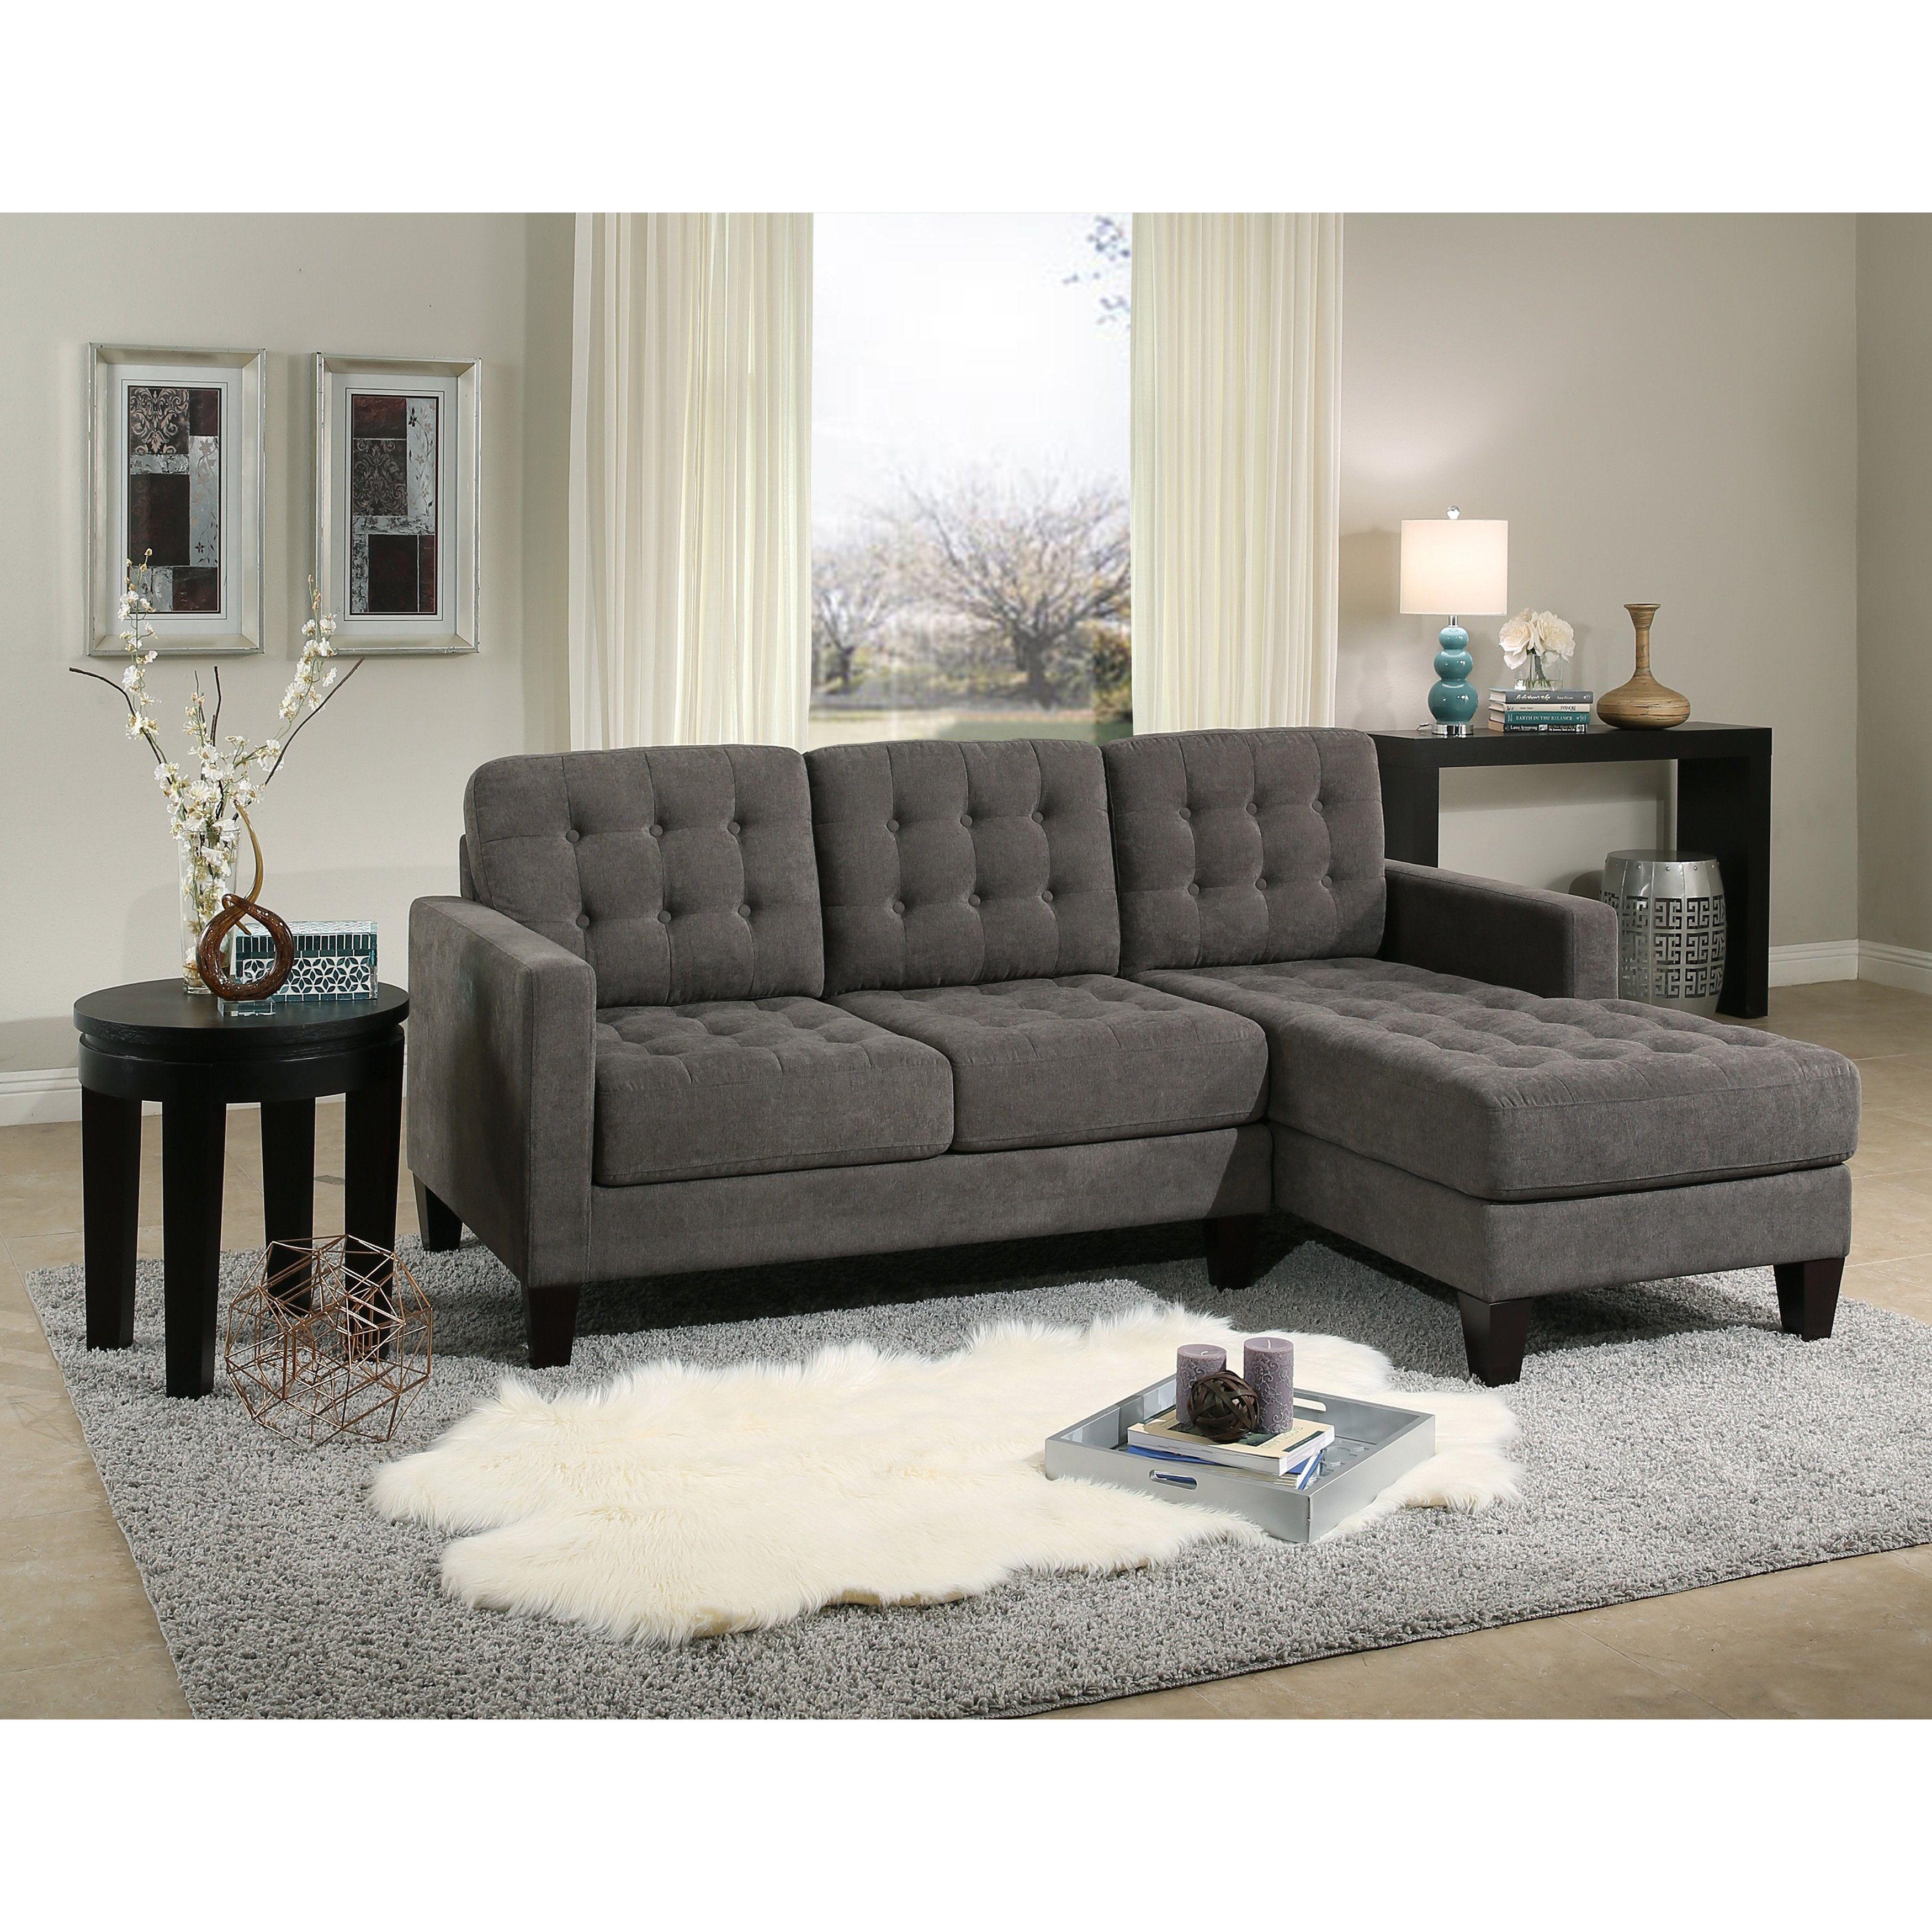 Best Abbyson Easton Grey Fabric Reversible Sectional Sofa Grey 400 x 300